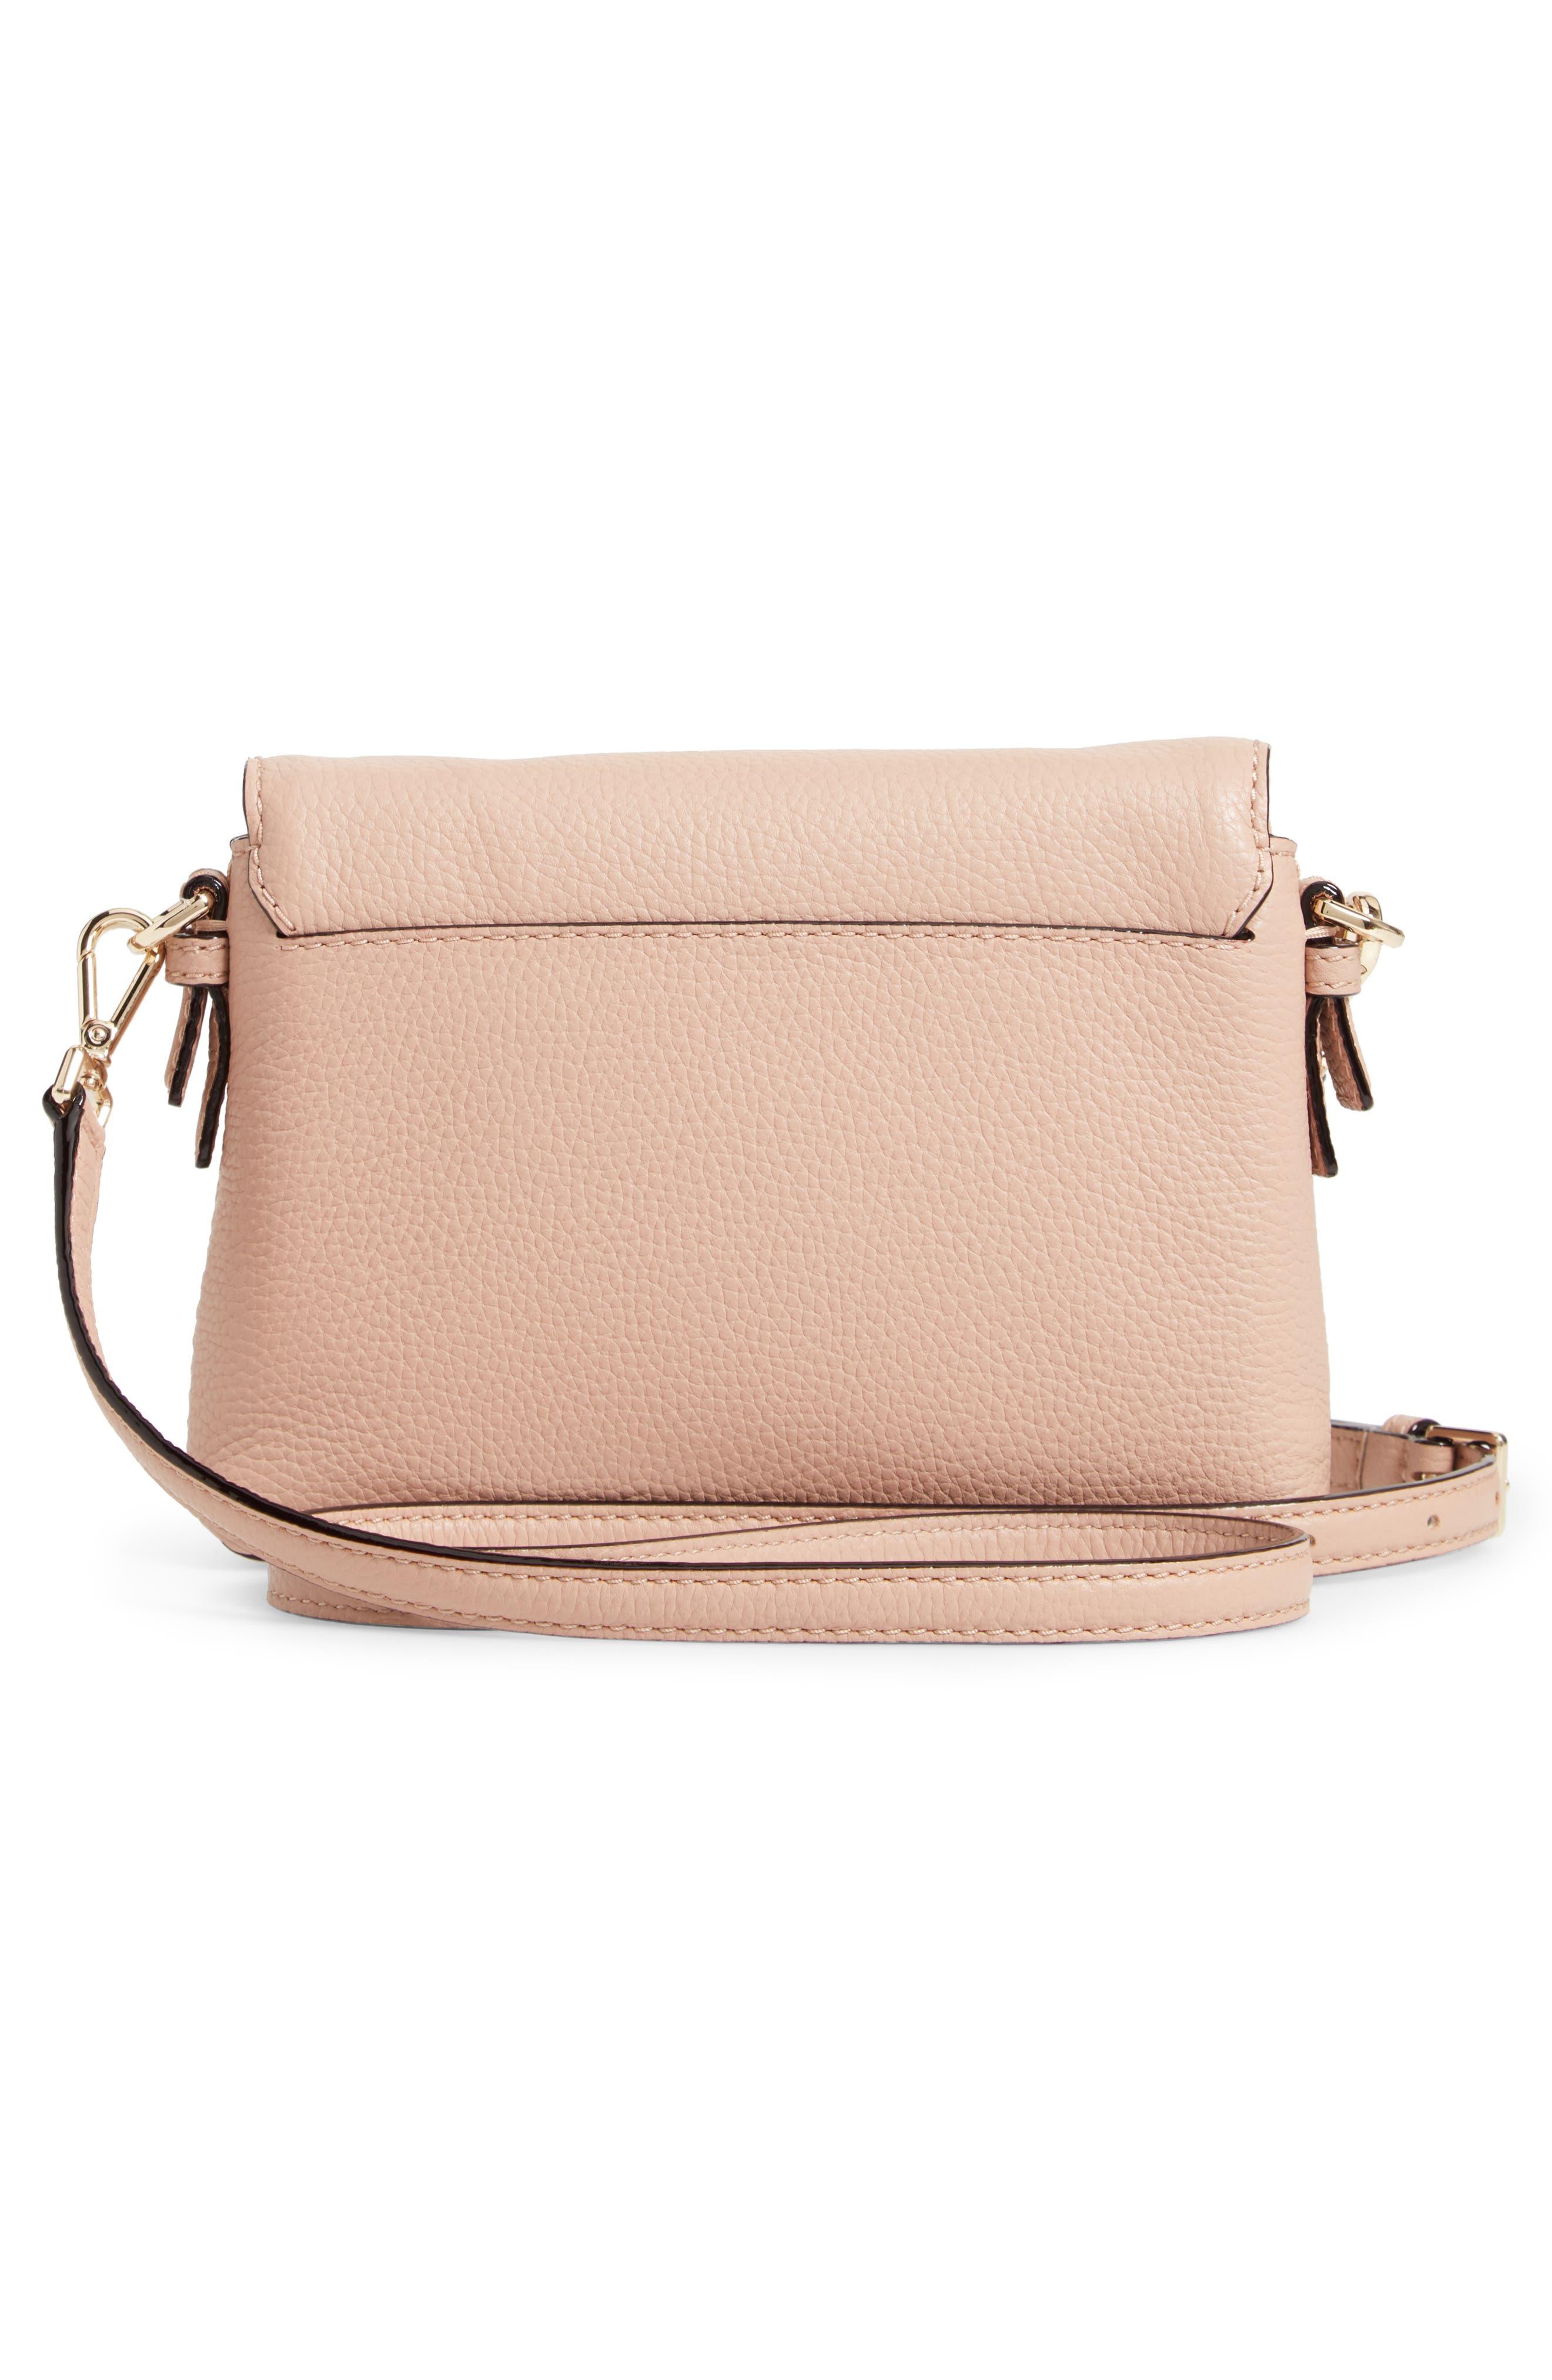 KATE SPADE NEW YORK,                             jackson street small harlyn leather crossbody bag,                             Alternate thumbnail 3, color,                             253